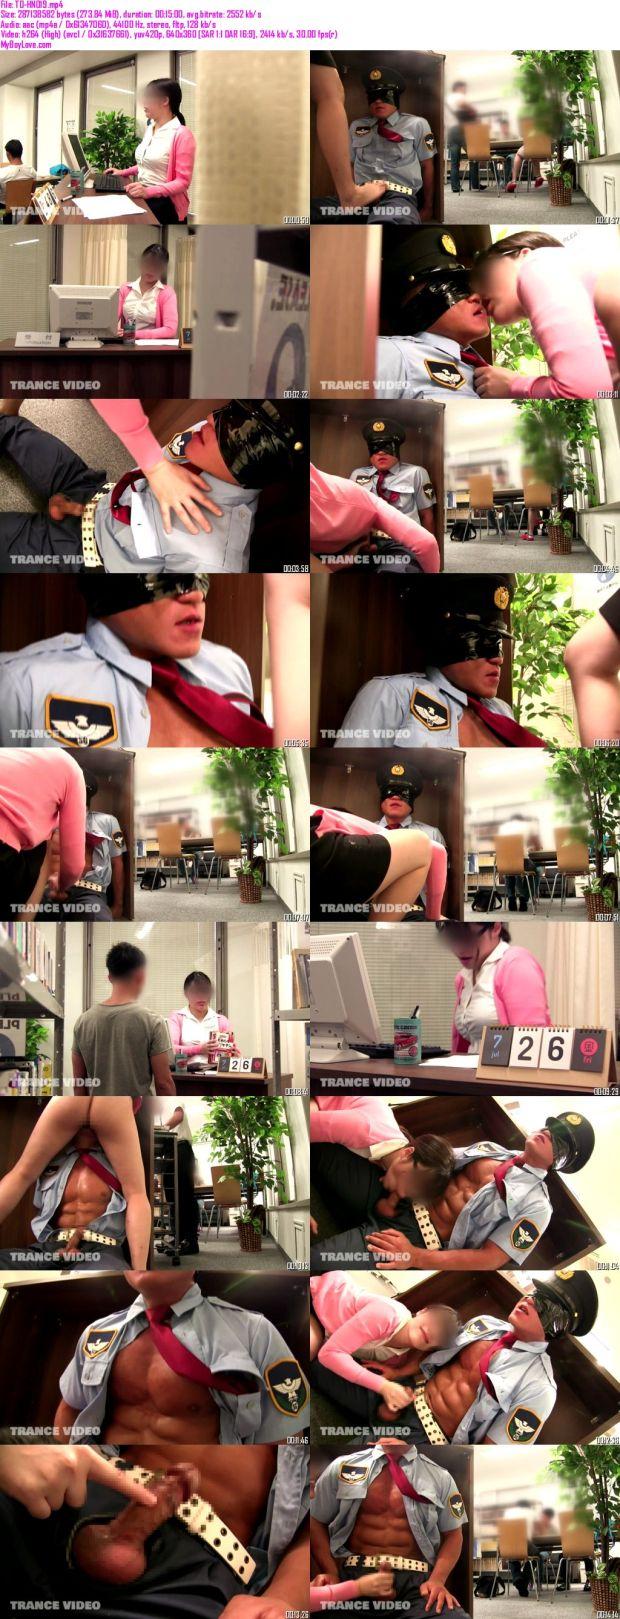 TRANCE VIDEO – TO-HN019 – ホントにあったノンケの情事 case19